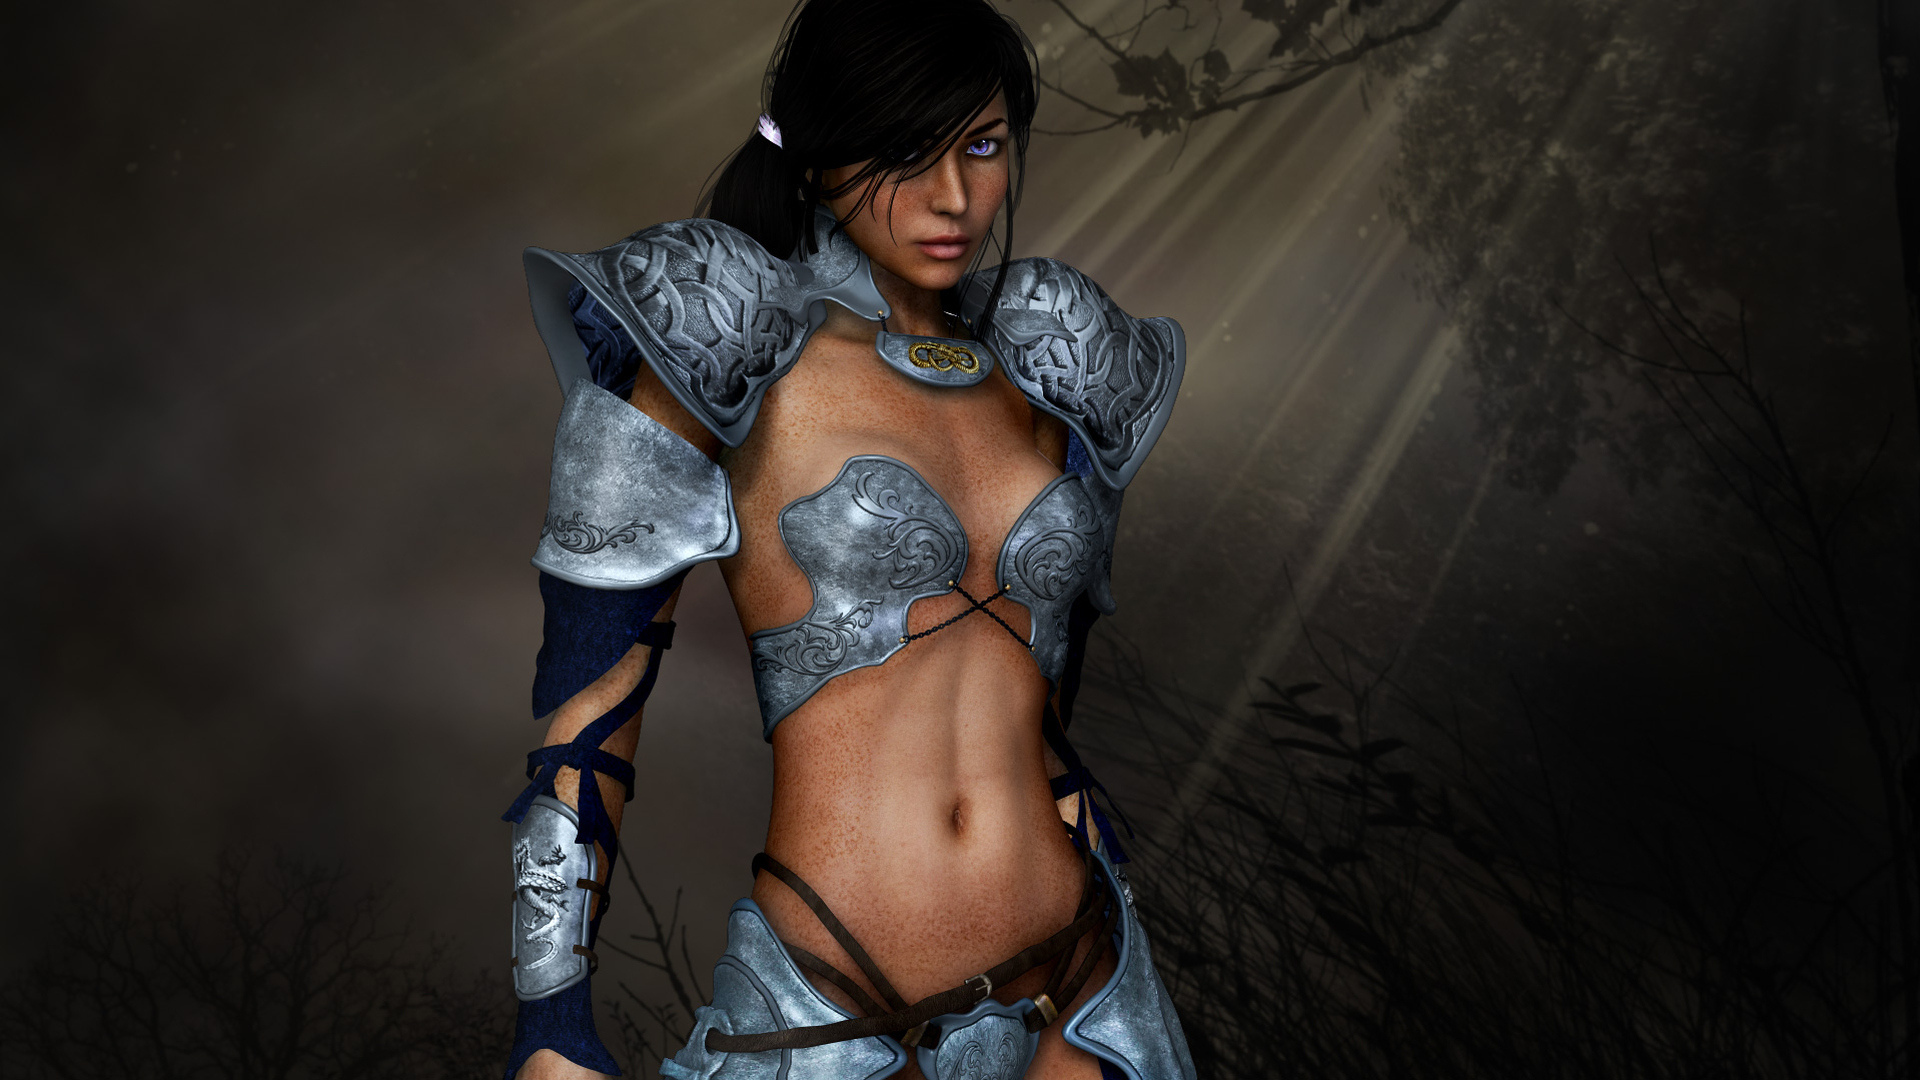 Warrior girl pics porn clips